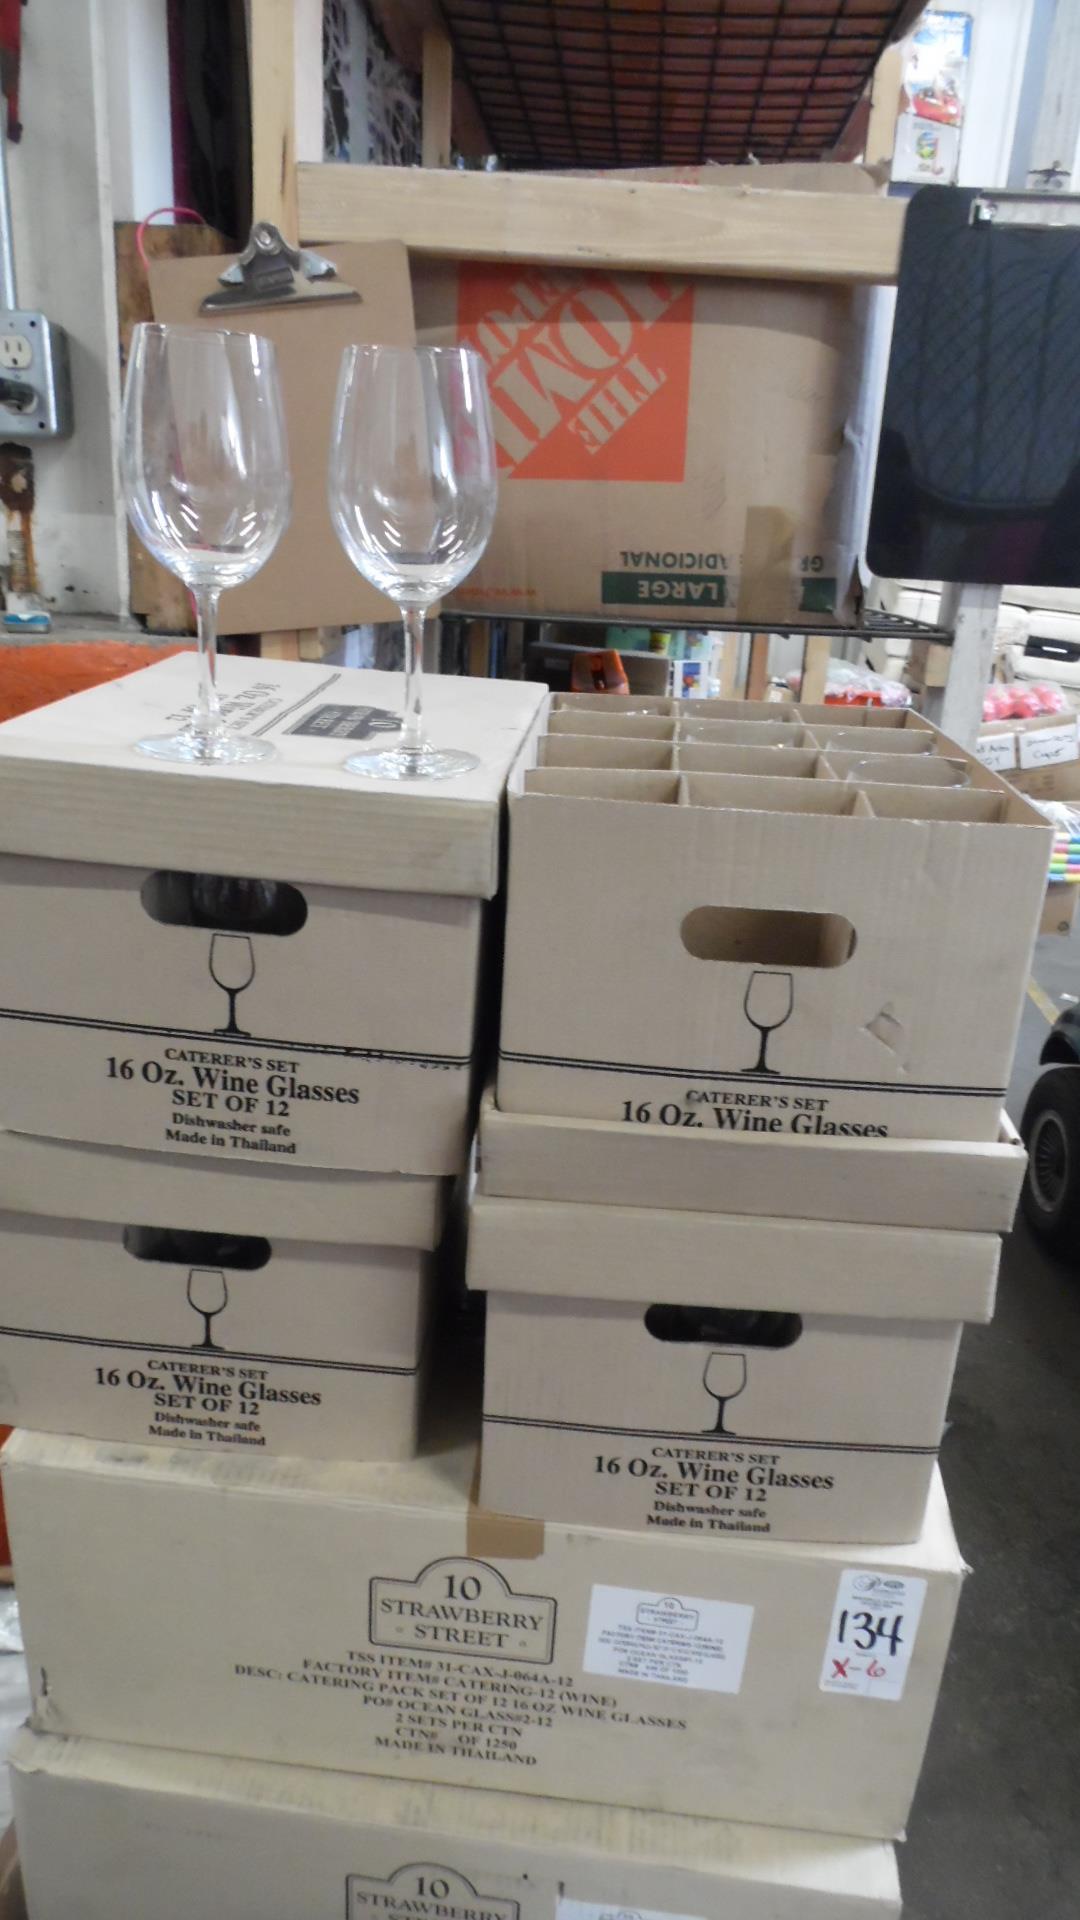 Lot 134 - CASES STRAWBERRY ST WINE GLASSES